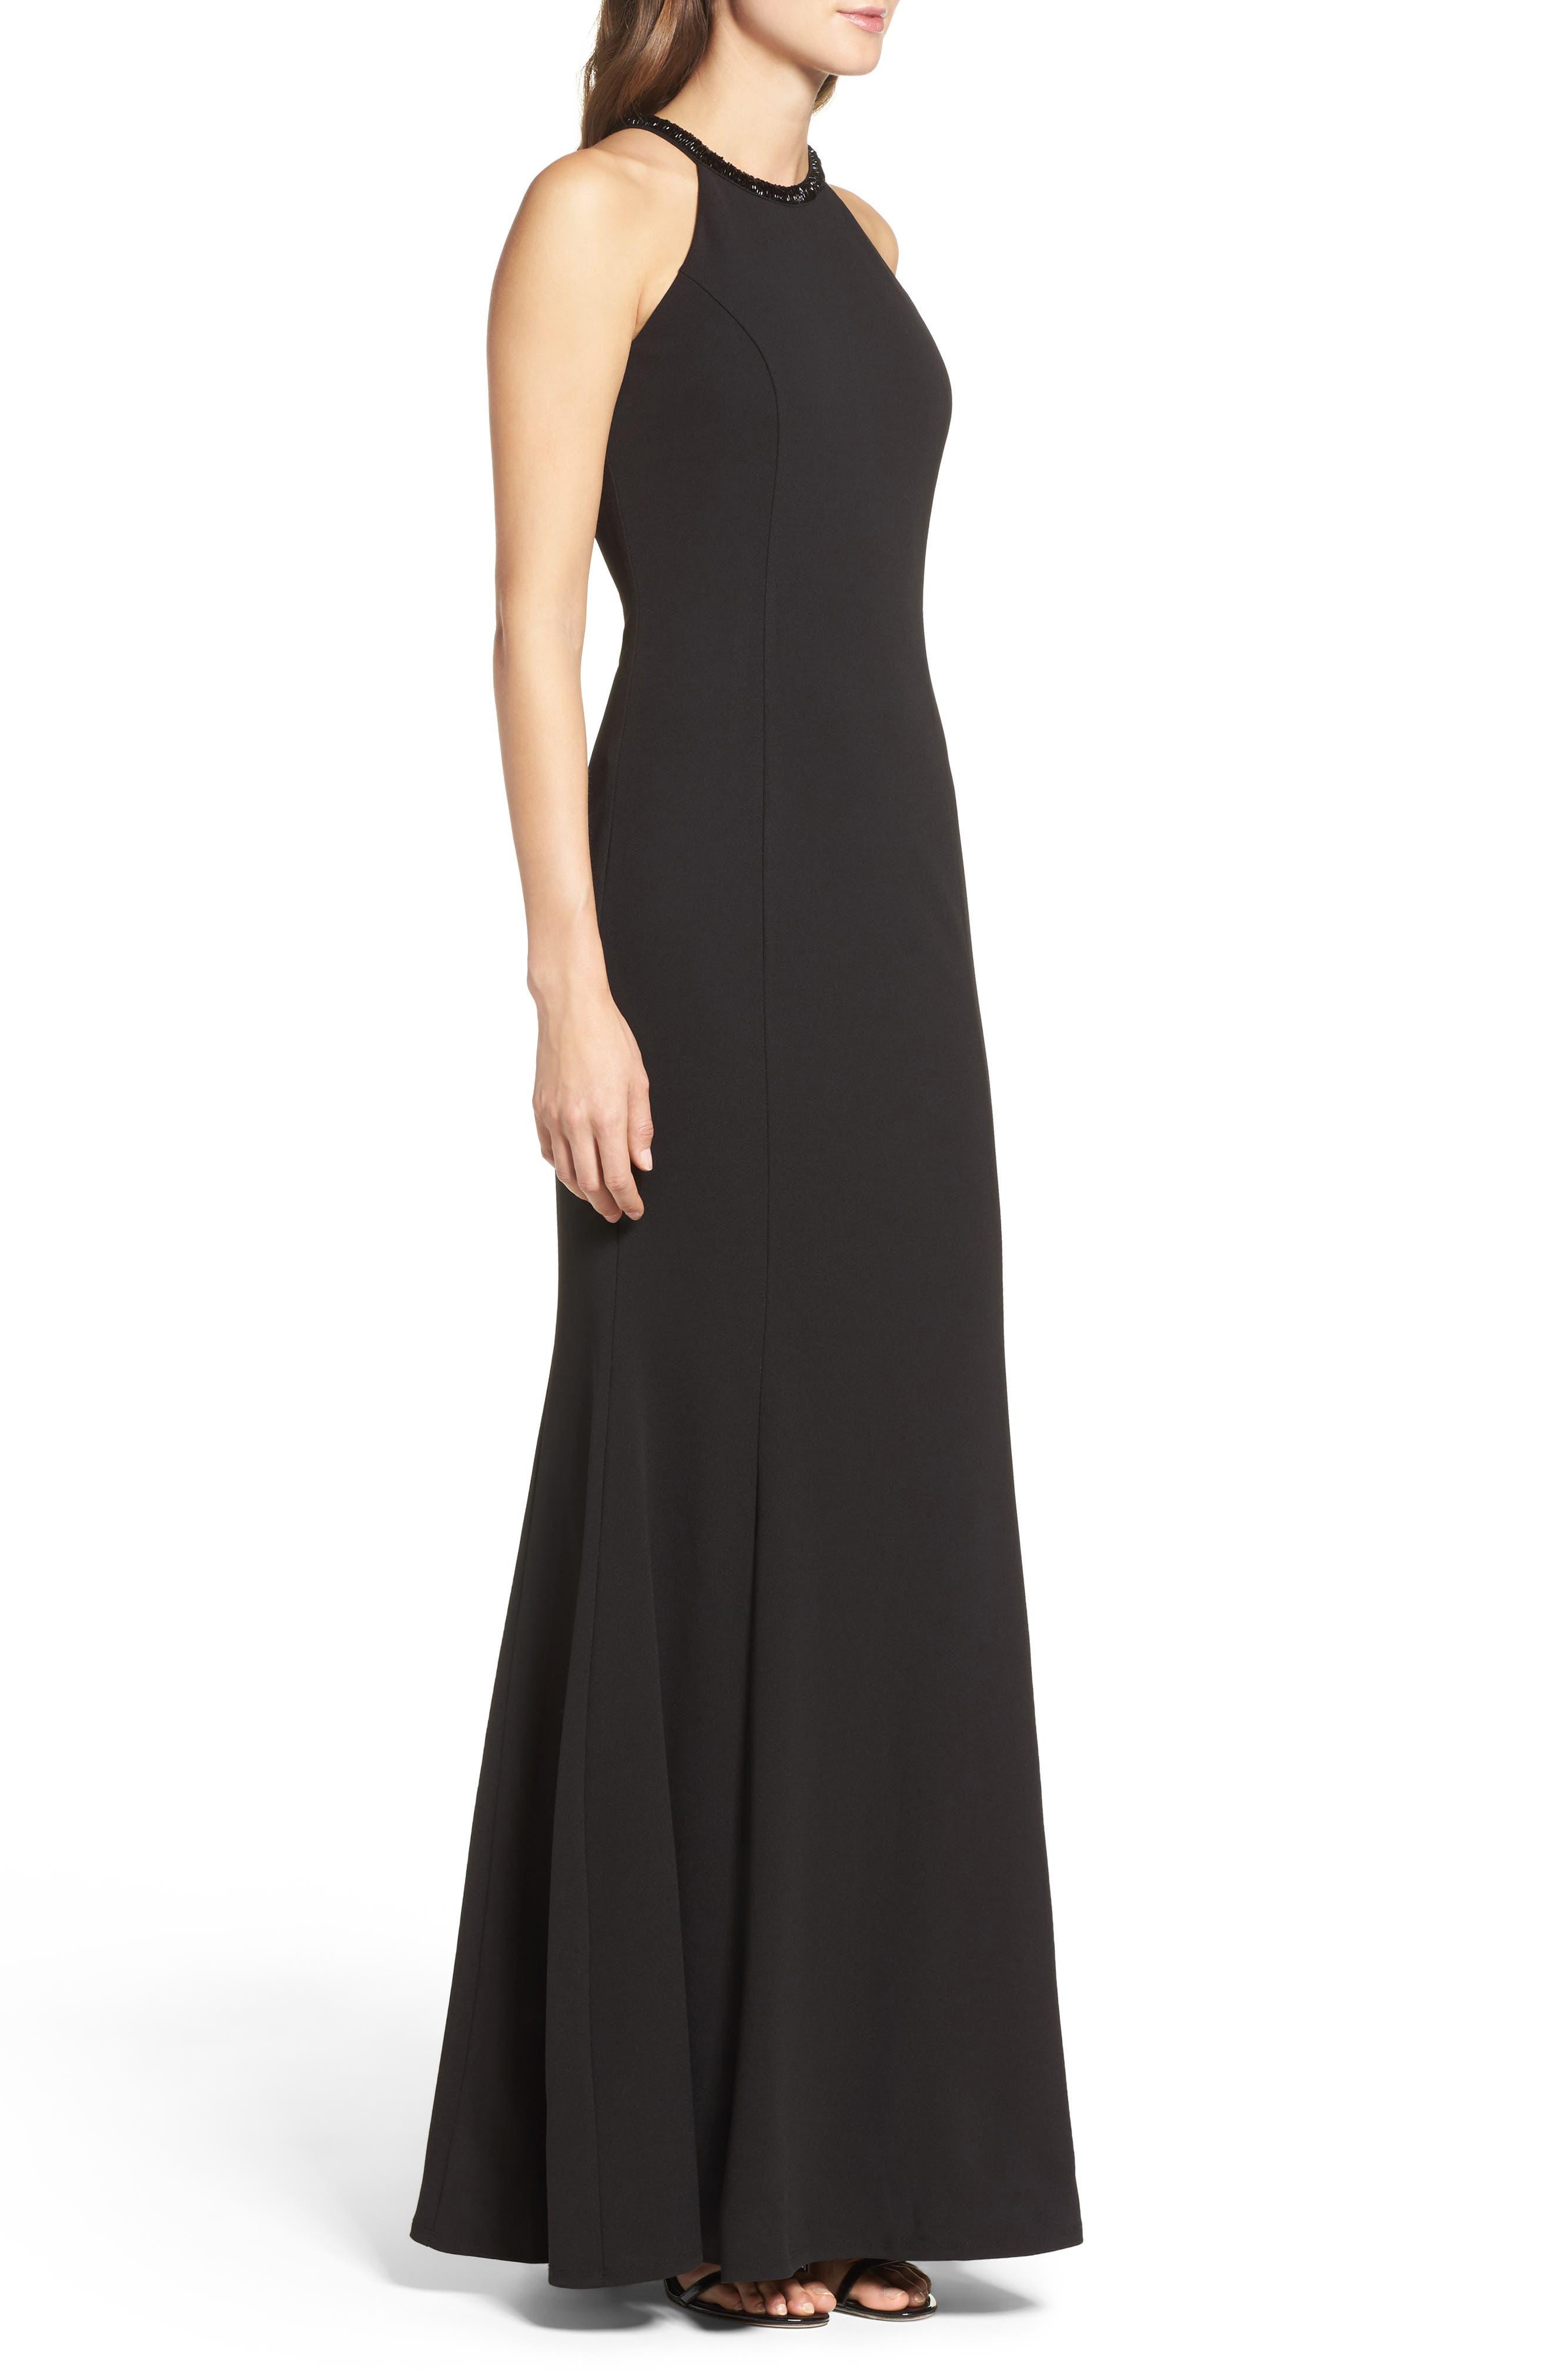 LULUS, Bead Neck Mermaid Gown, Alternate thumbnail 4, color, BLACK